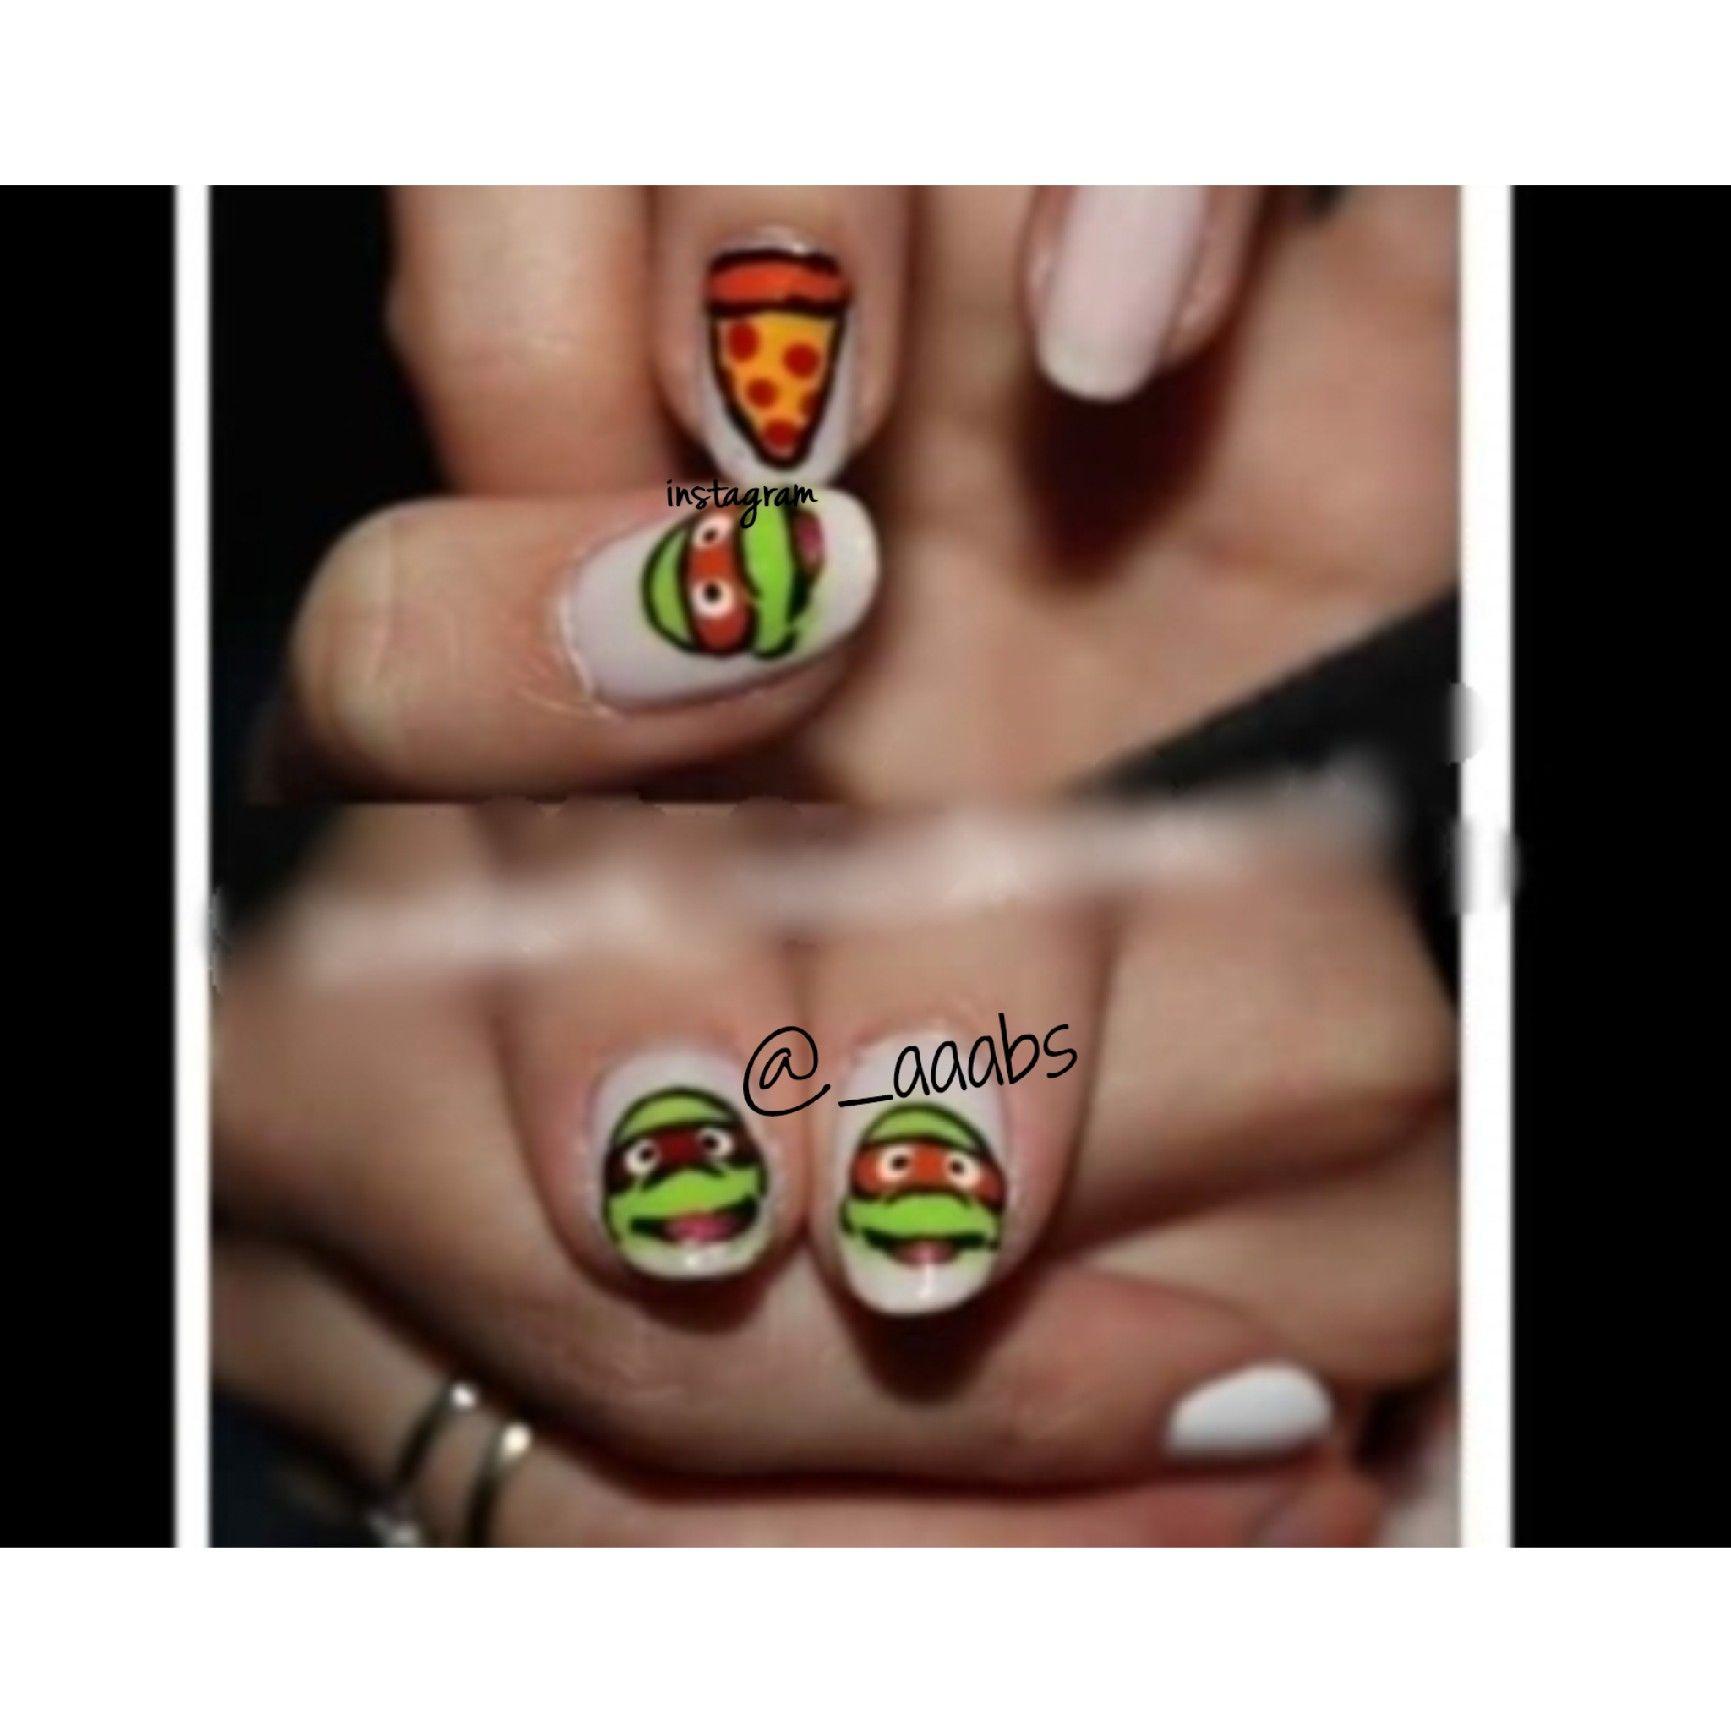 Unique Ninja Turtle Nails Photos - Nail Art Design Ideas ...